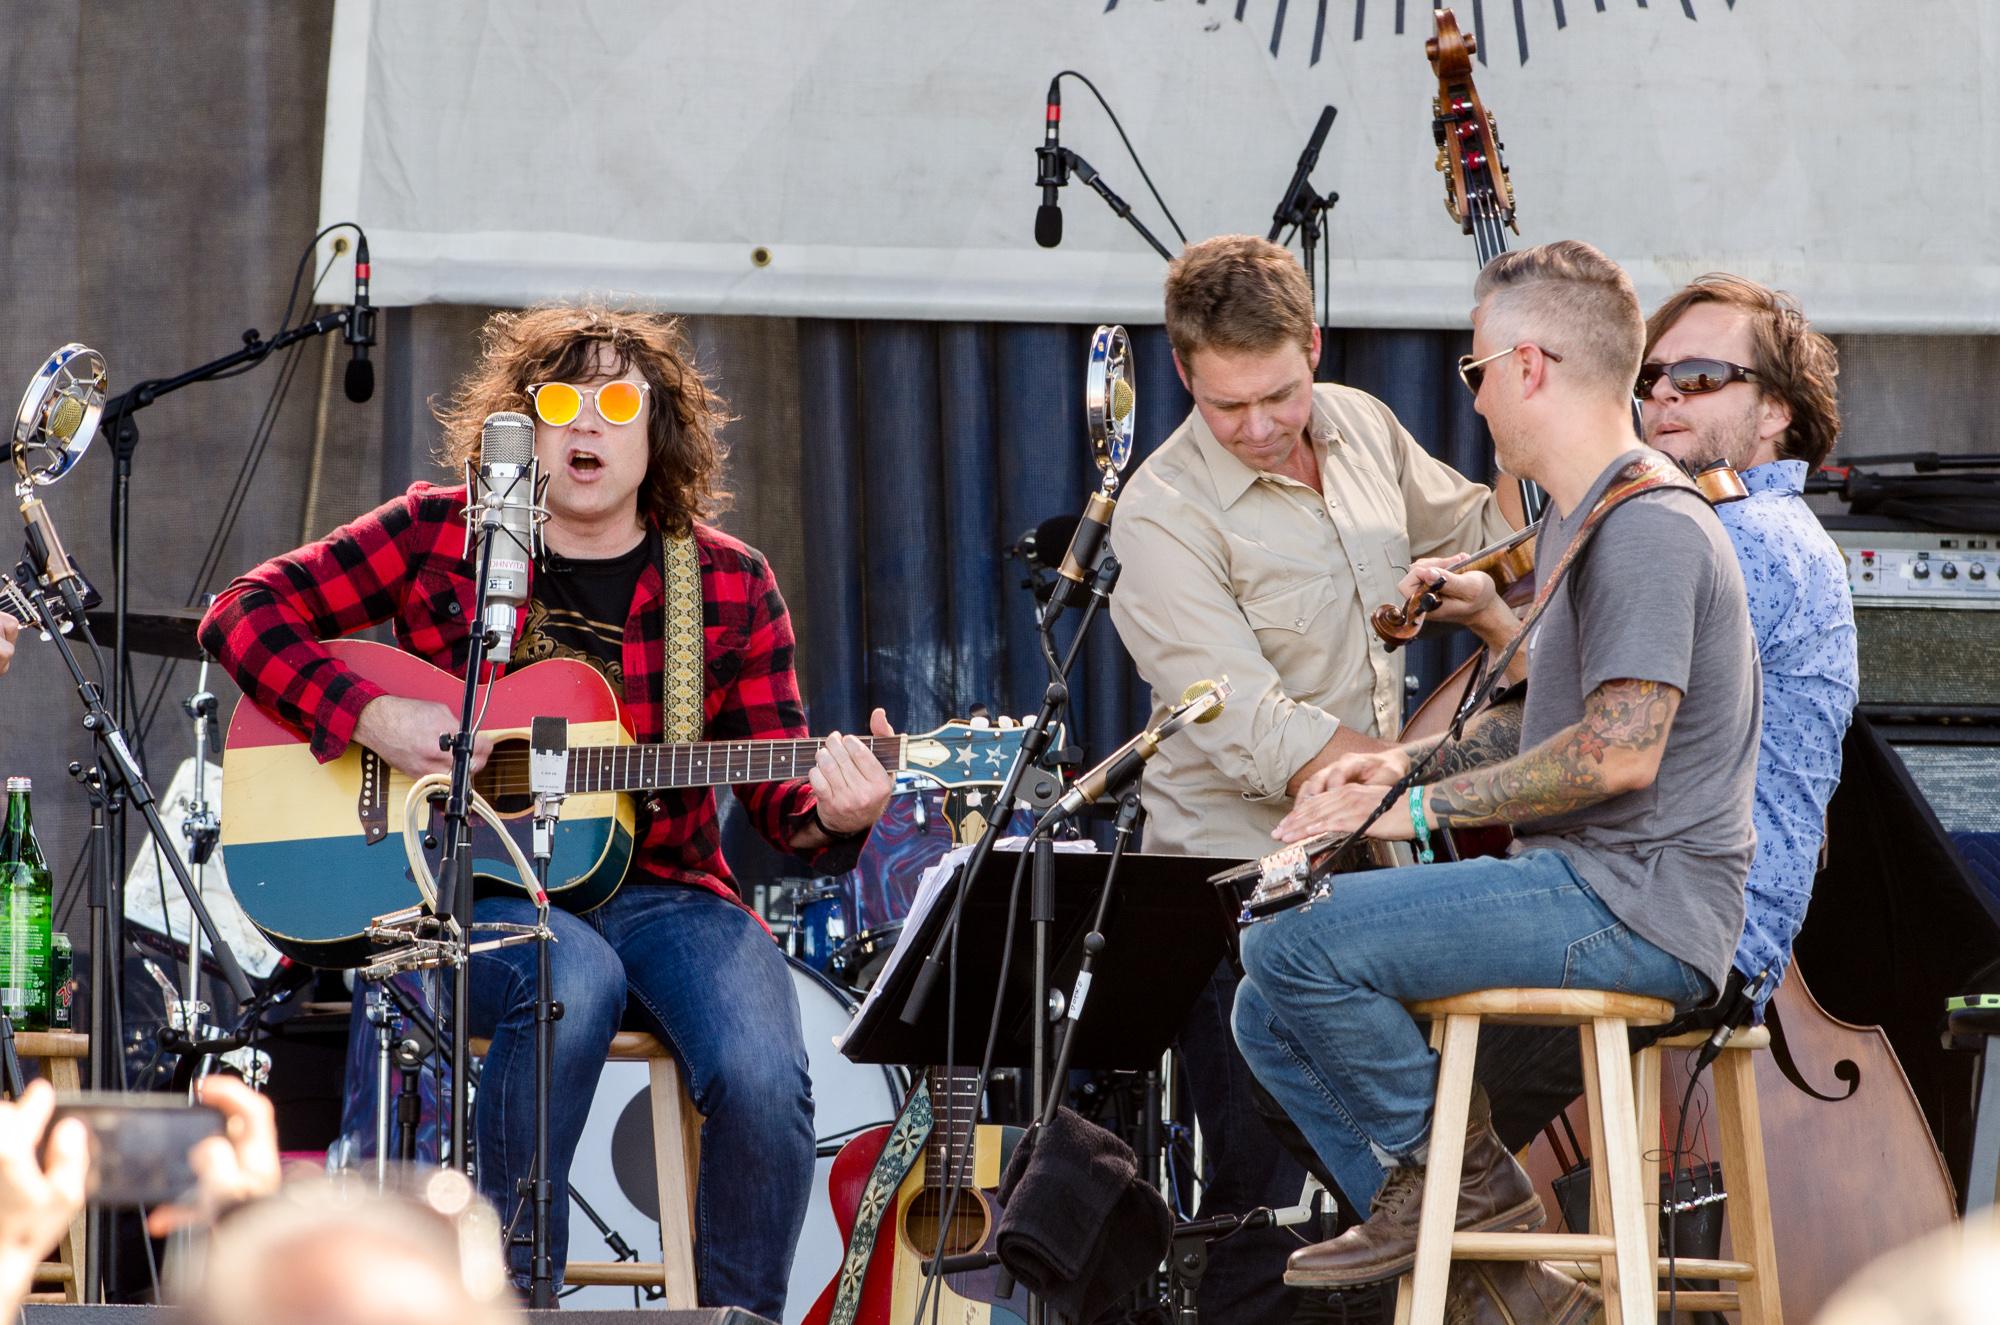 Ben-Kaye-Newport-Folk-Fest-Ryan-Adams-with-The-Infamous-Stringdusters-Featuring-Nicki-Bluhm-3